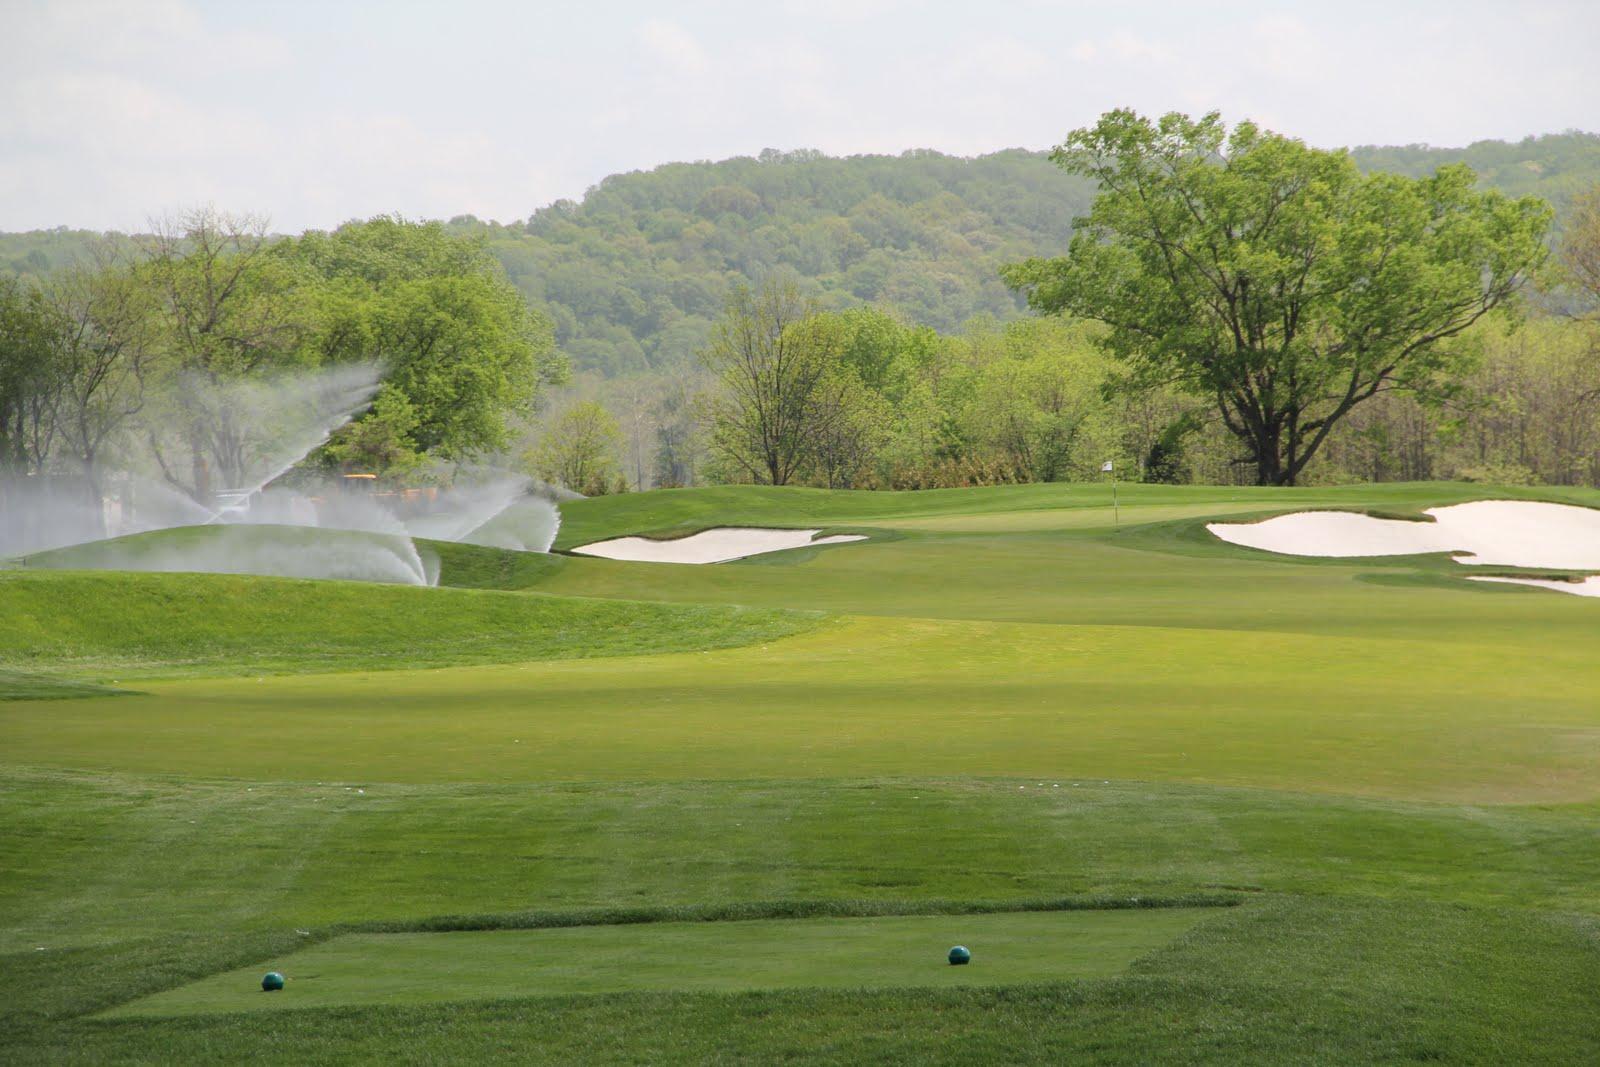 Irrigation tech making work easier for superintendents - Golfdom